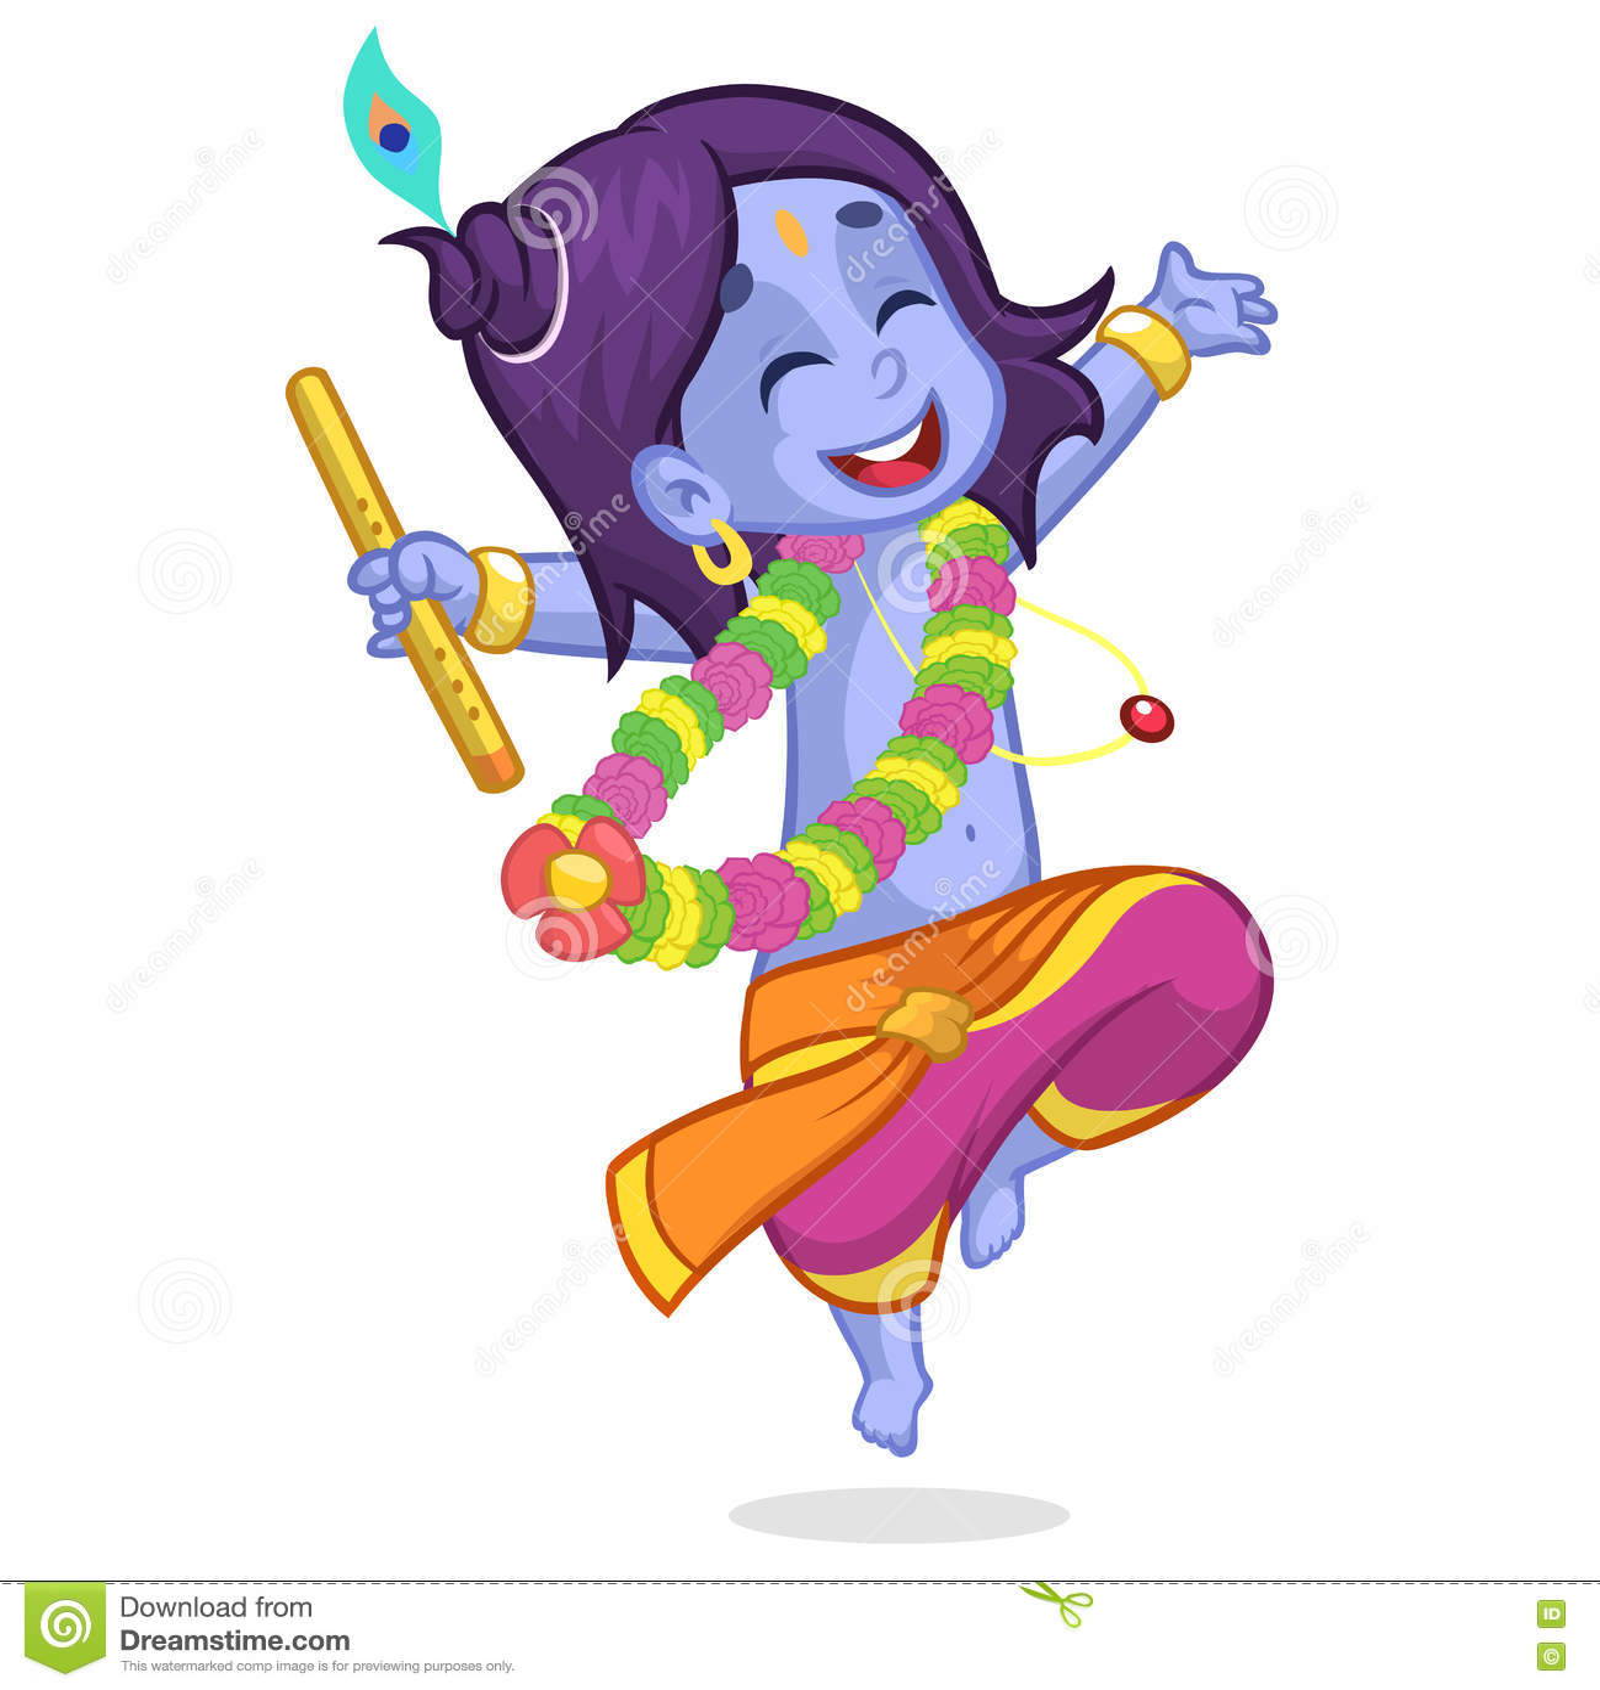 Little cartoon krishna with eyes closed dancing with a flute little cartoon krishna with eyes closed dancing with a flute greeting card for krishna birthday vector illustration kristyandbryce Gallery